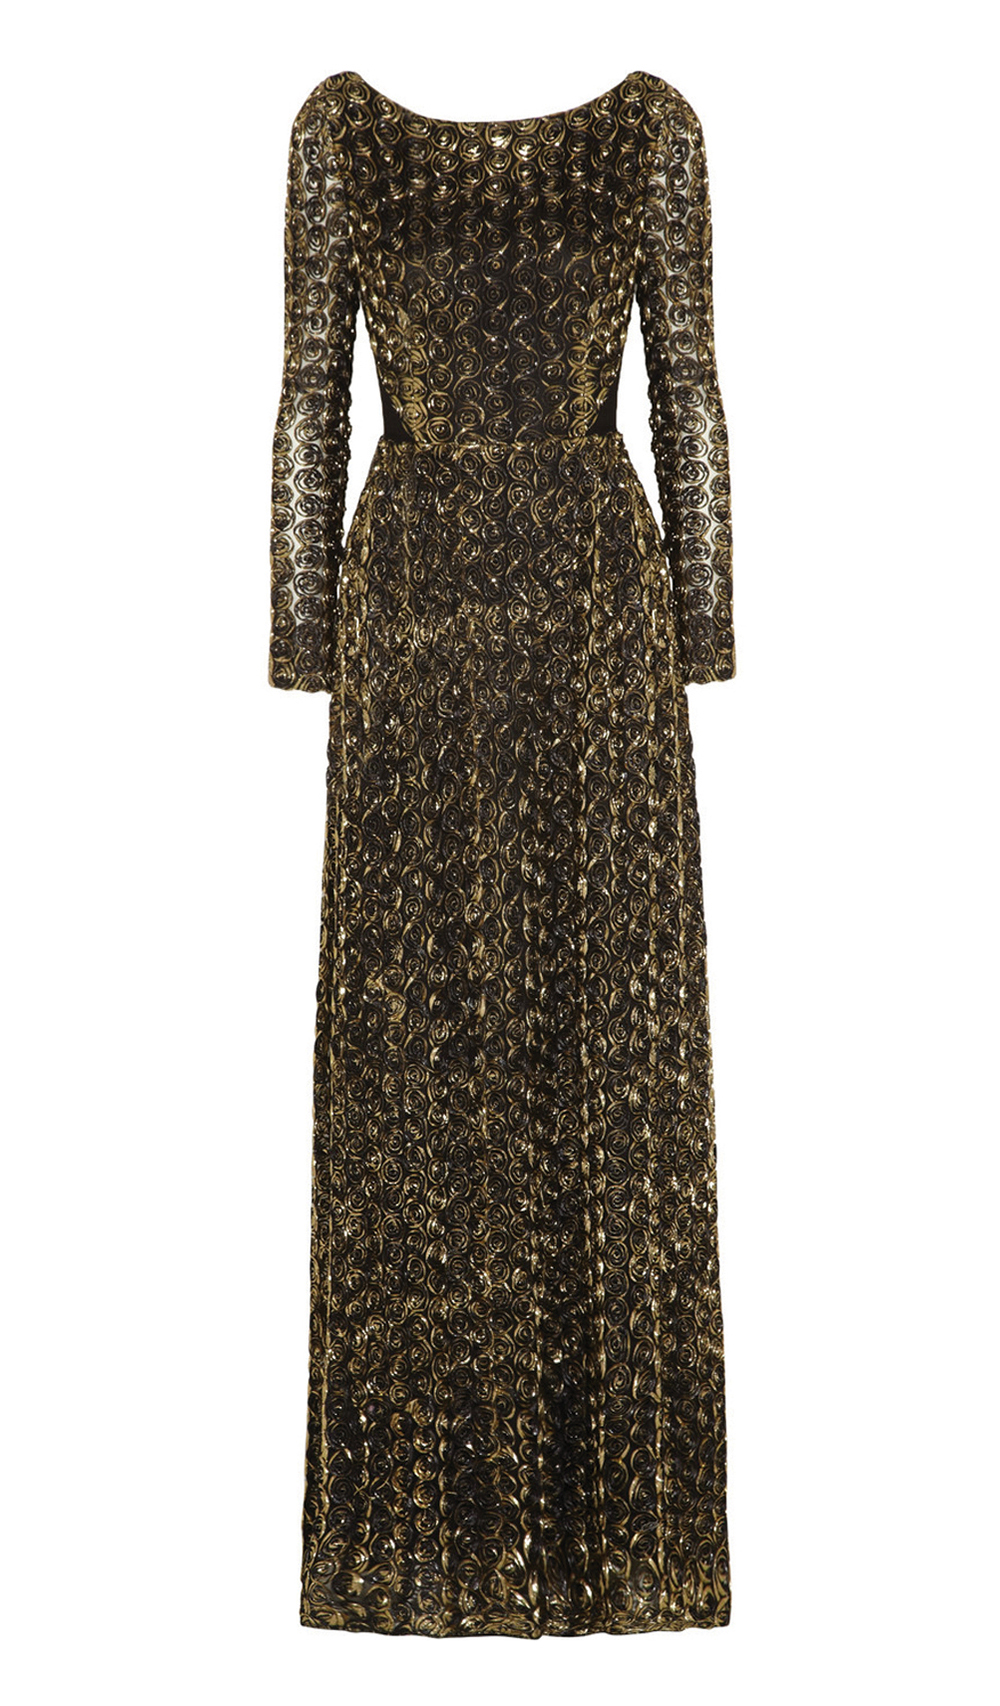 Temperley London Long Donna Dress 坦波麗倫敦連衣裙 US$950